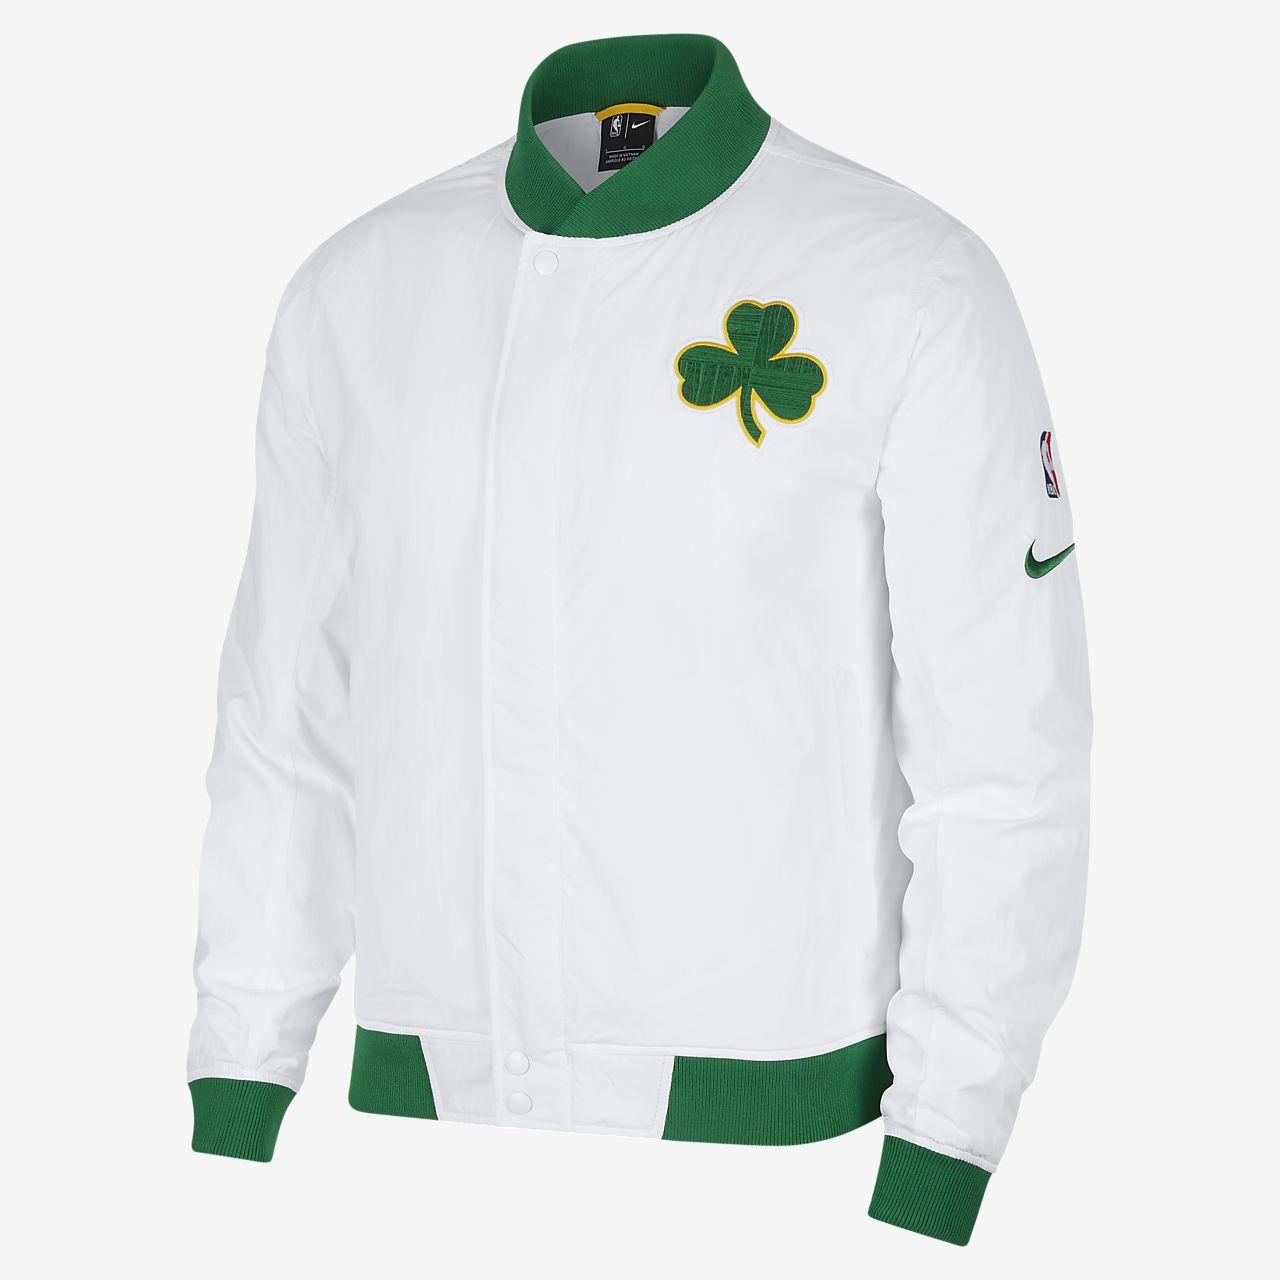 ada41fd33 Boston Celtics Nike Courtside Men s NBA Jacket. Nike.com GB